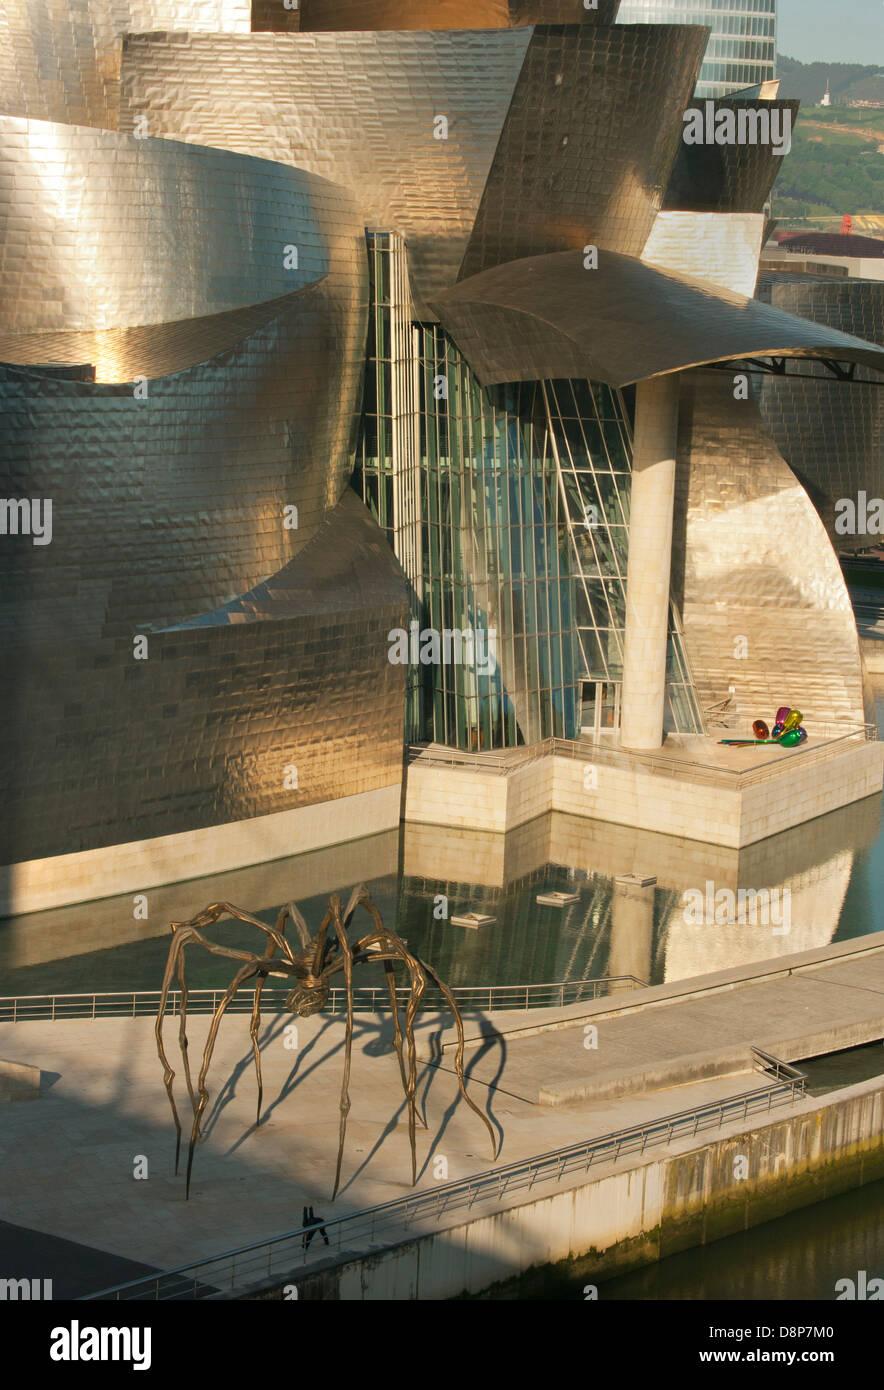 Guggenheim Museum, Bilbao, Spanien, Architekt: Frank Gehry Stockfoto